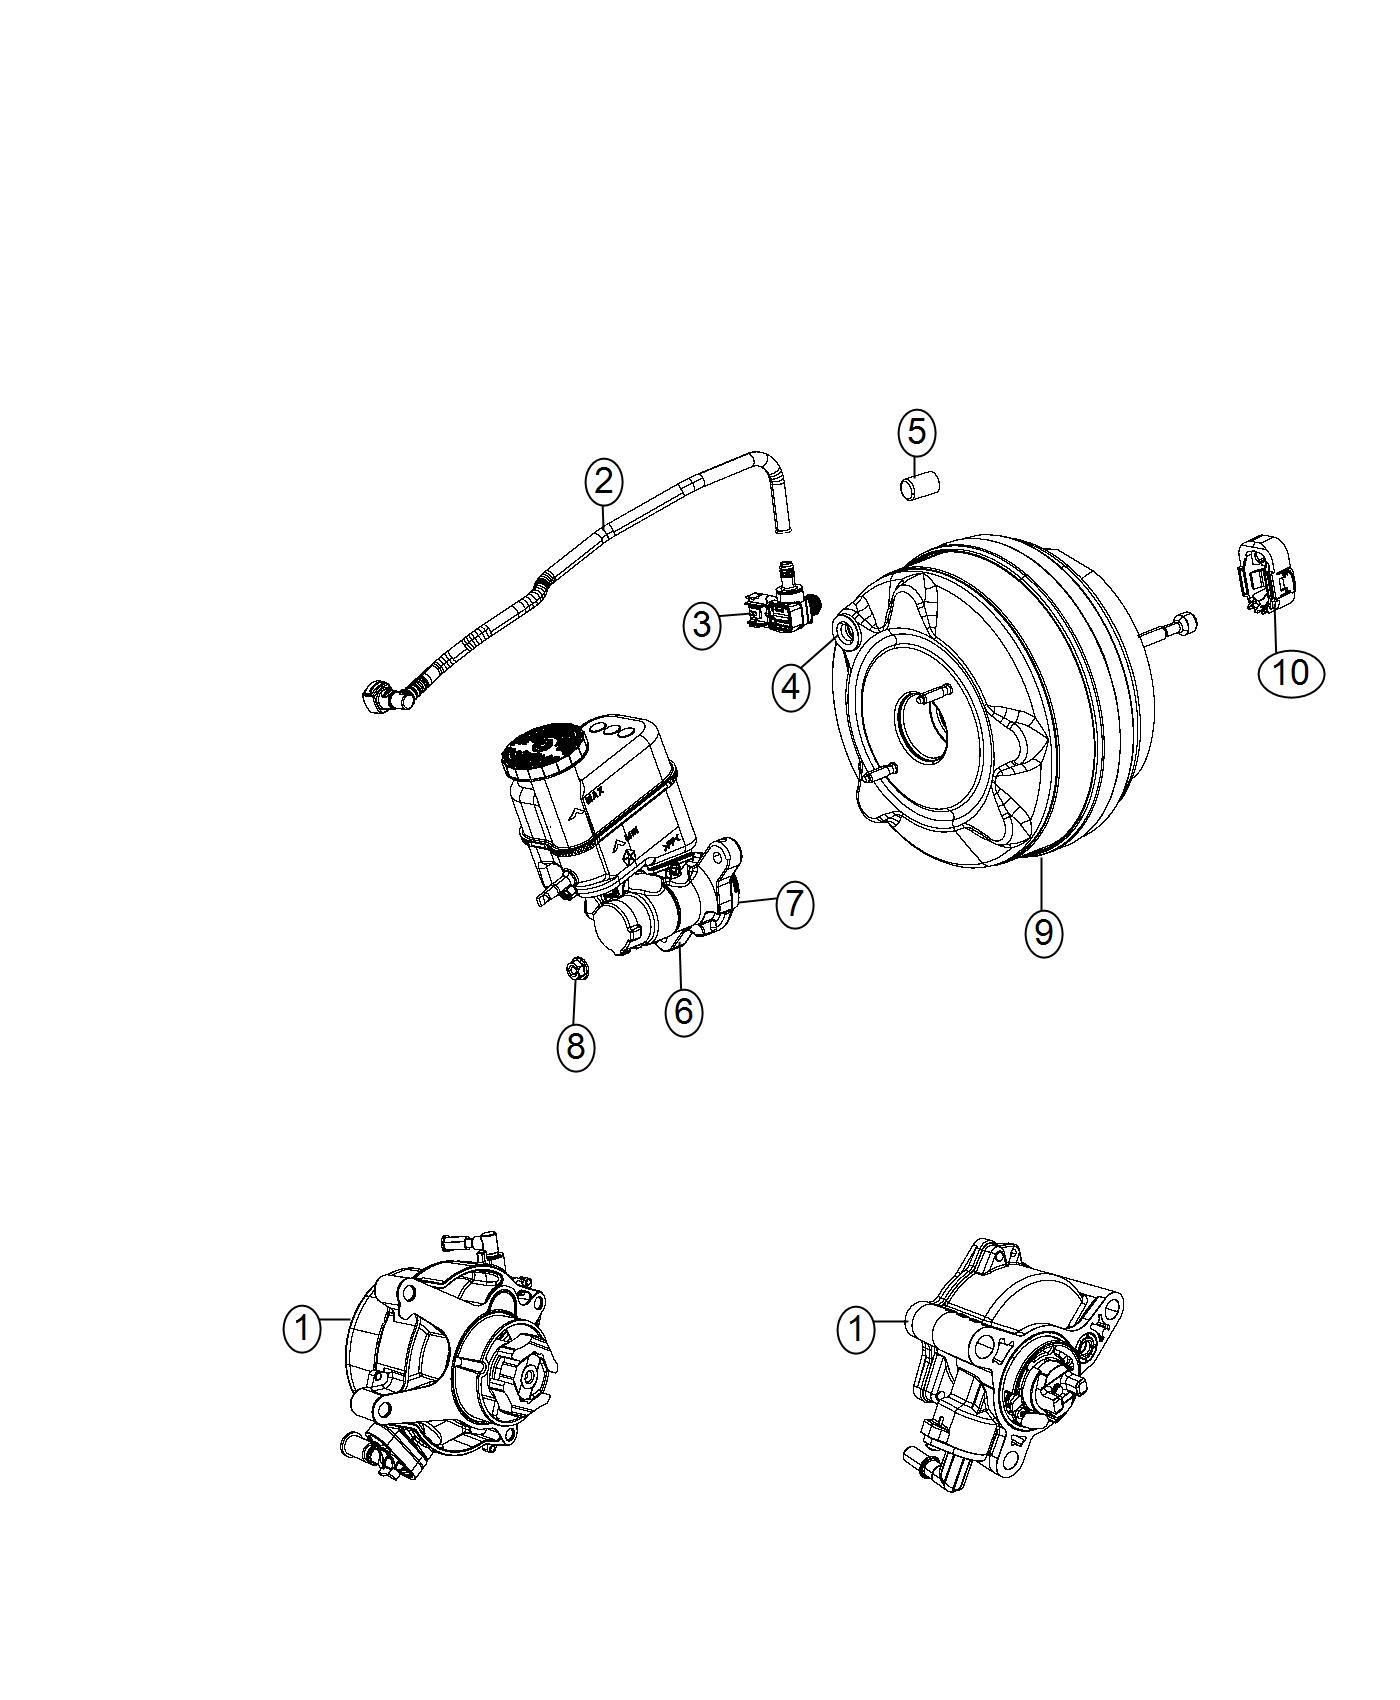 04581560AE - Jeep Hose. Brake booster vacuum. Pump, power ...